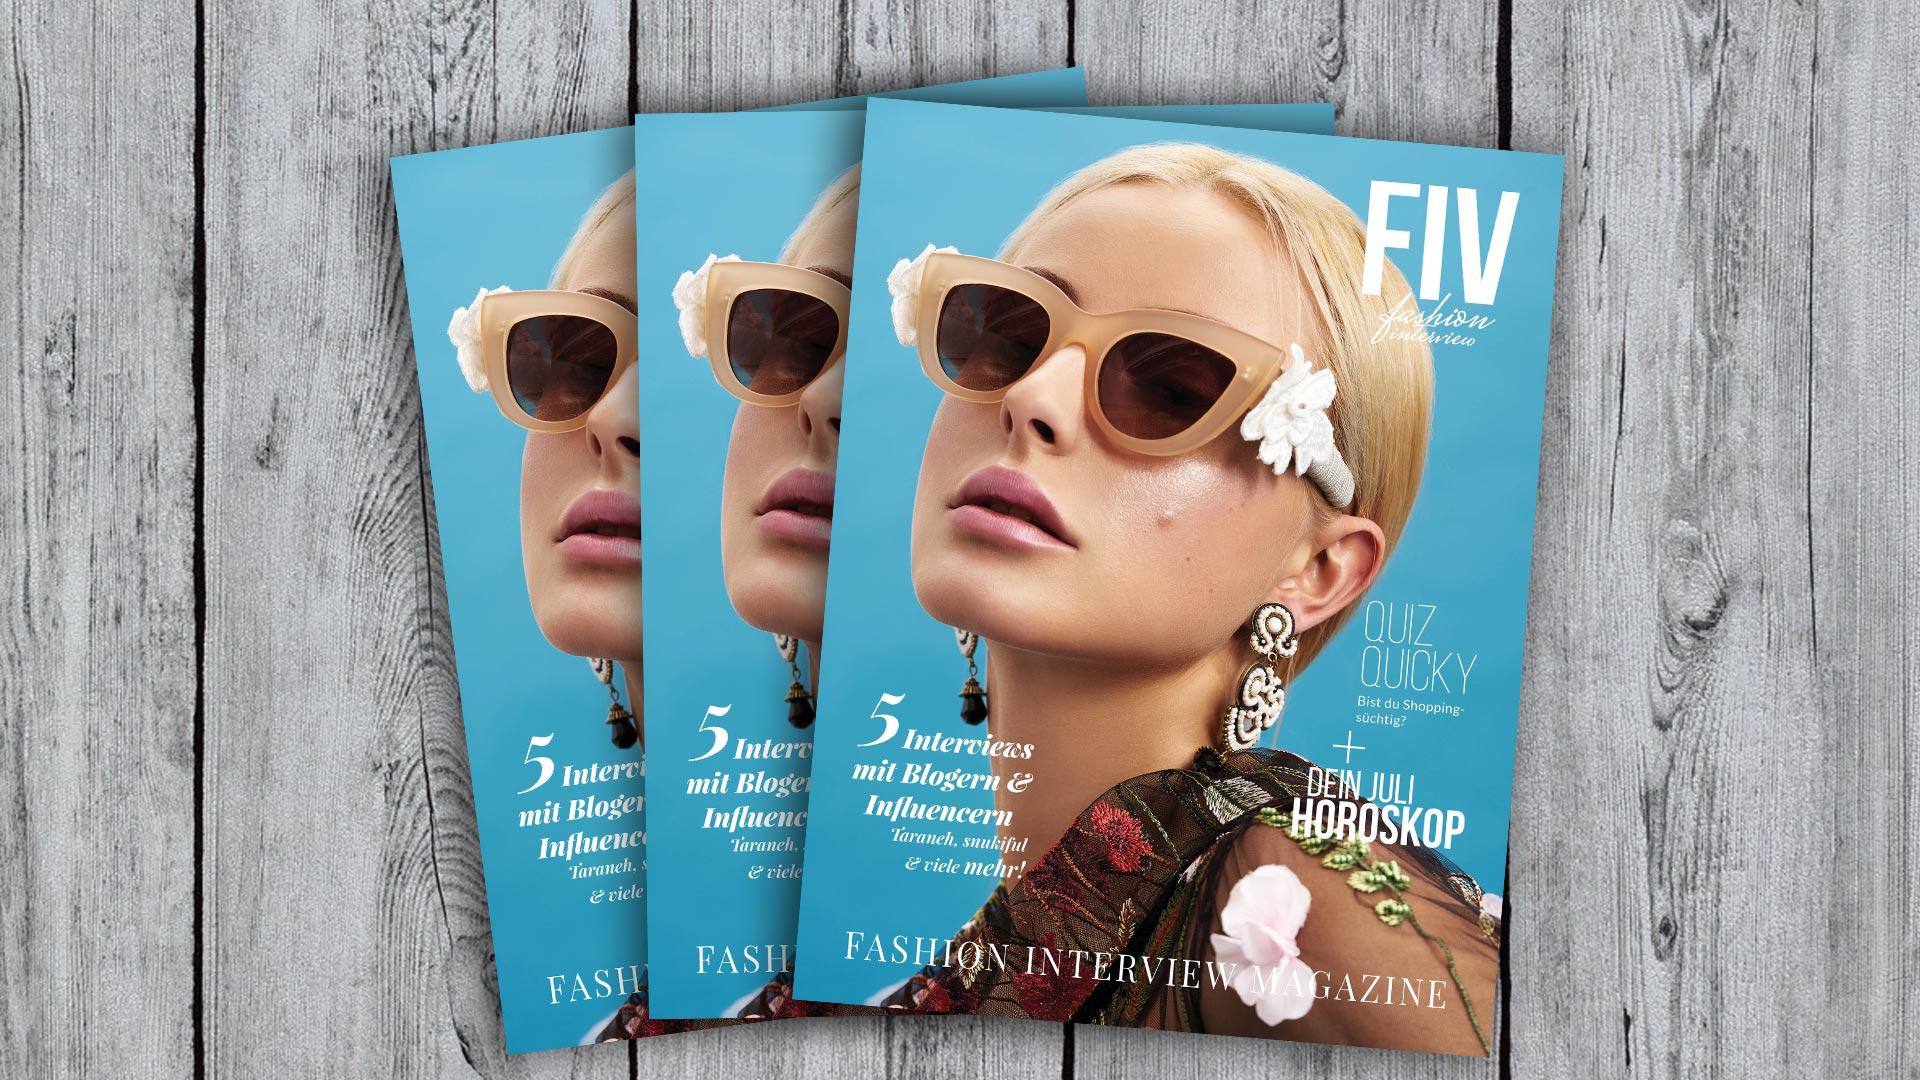 FIV Magazine #3 July - Blogger, Editorials, Column, Horoscop, Quiz and more!